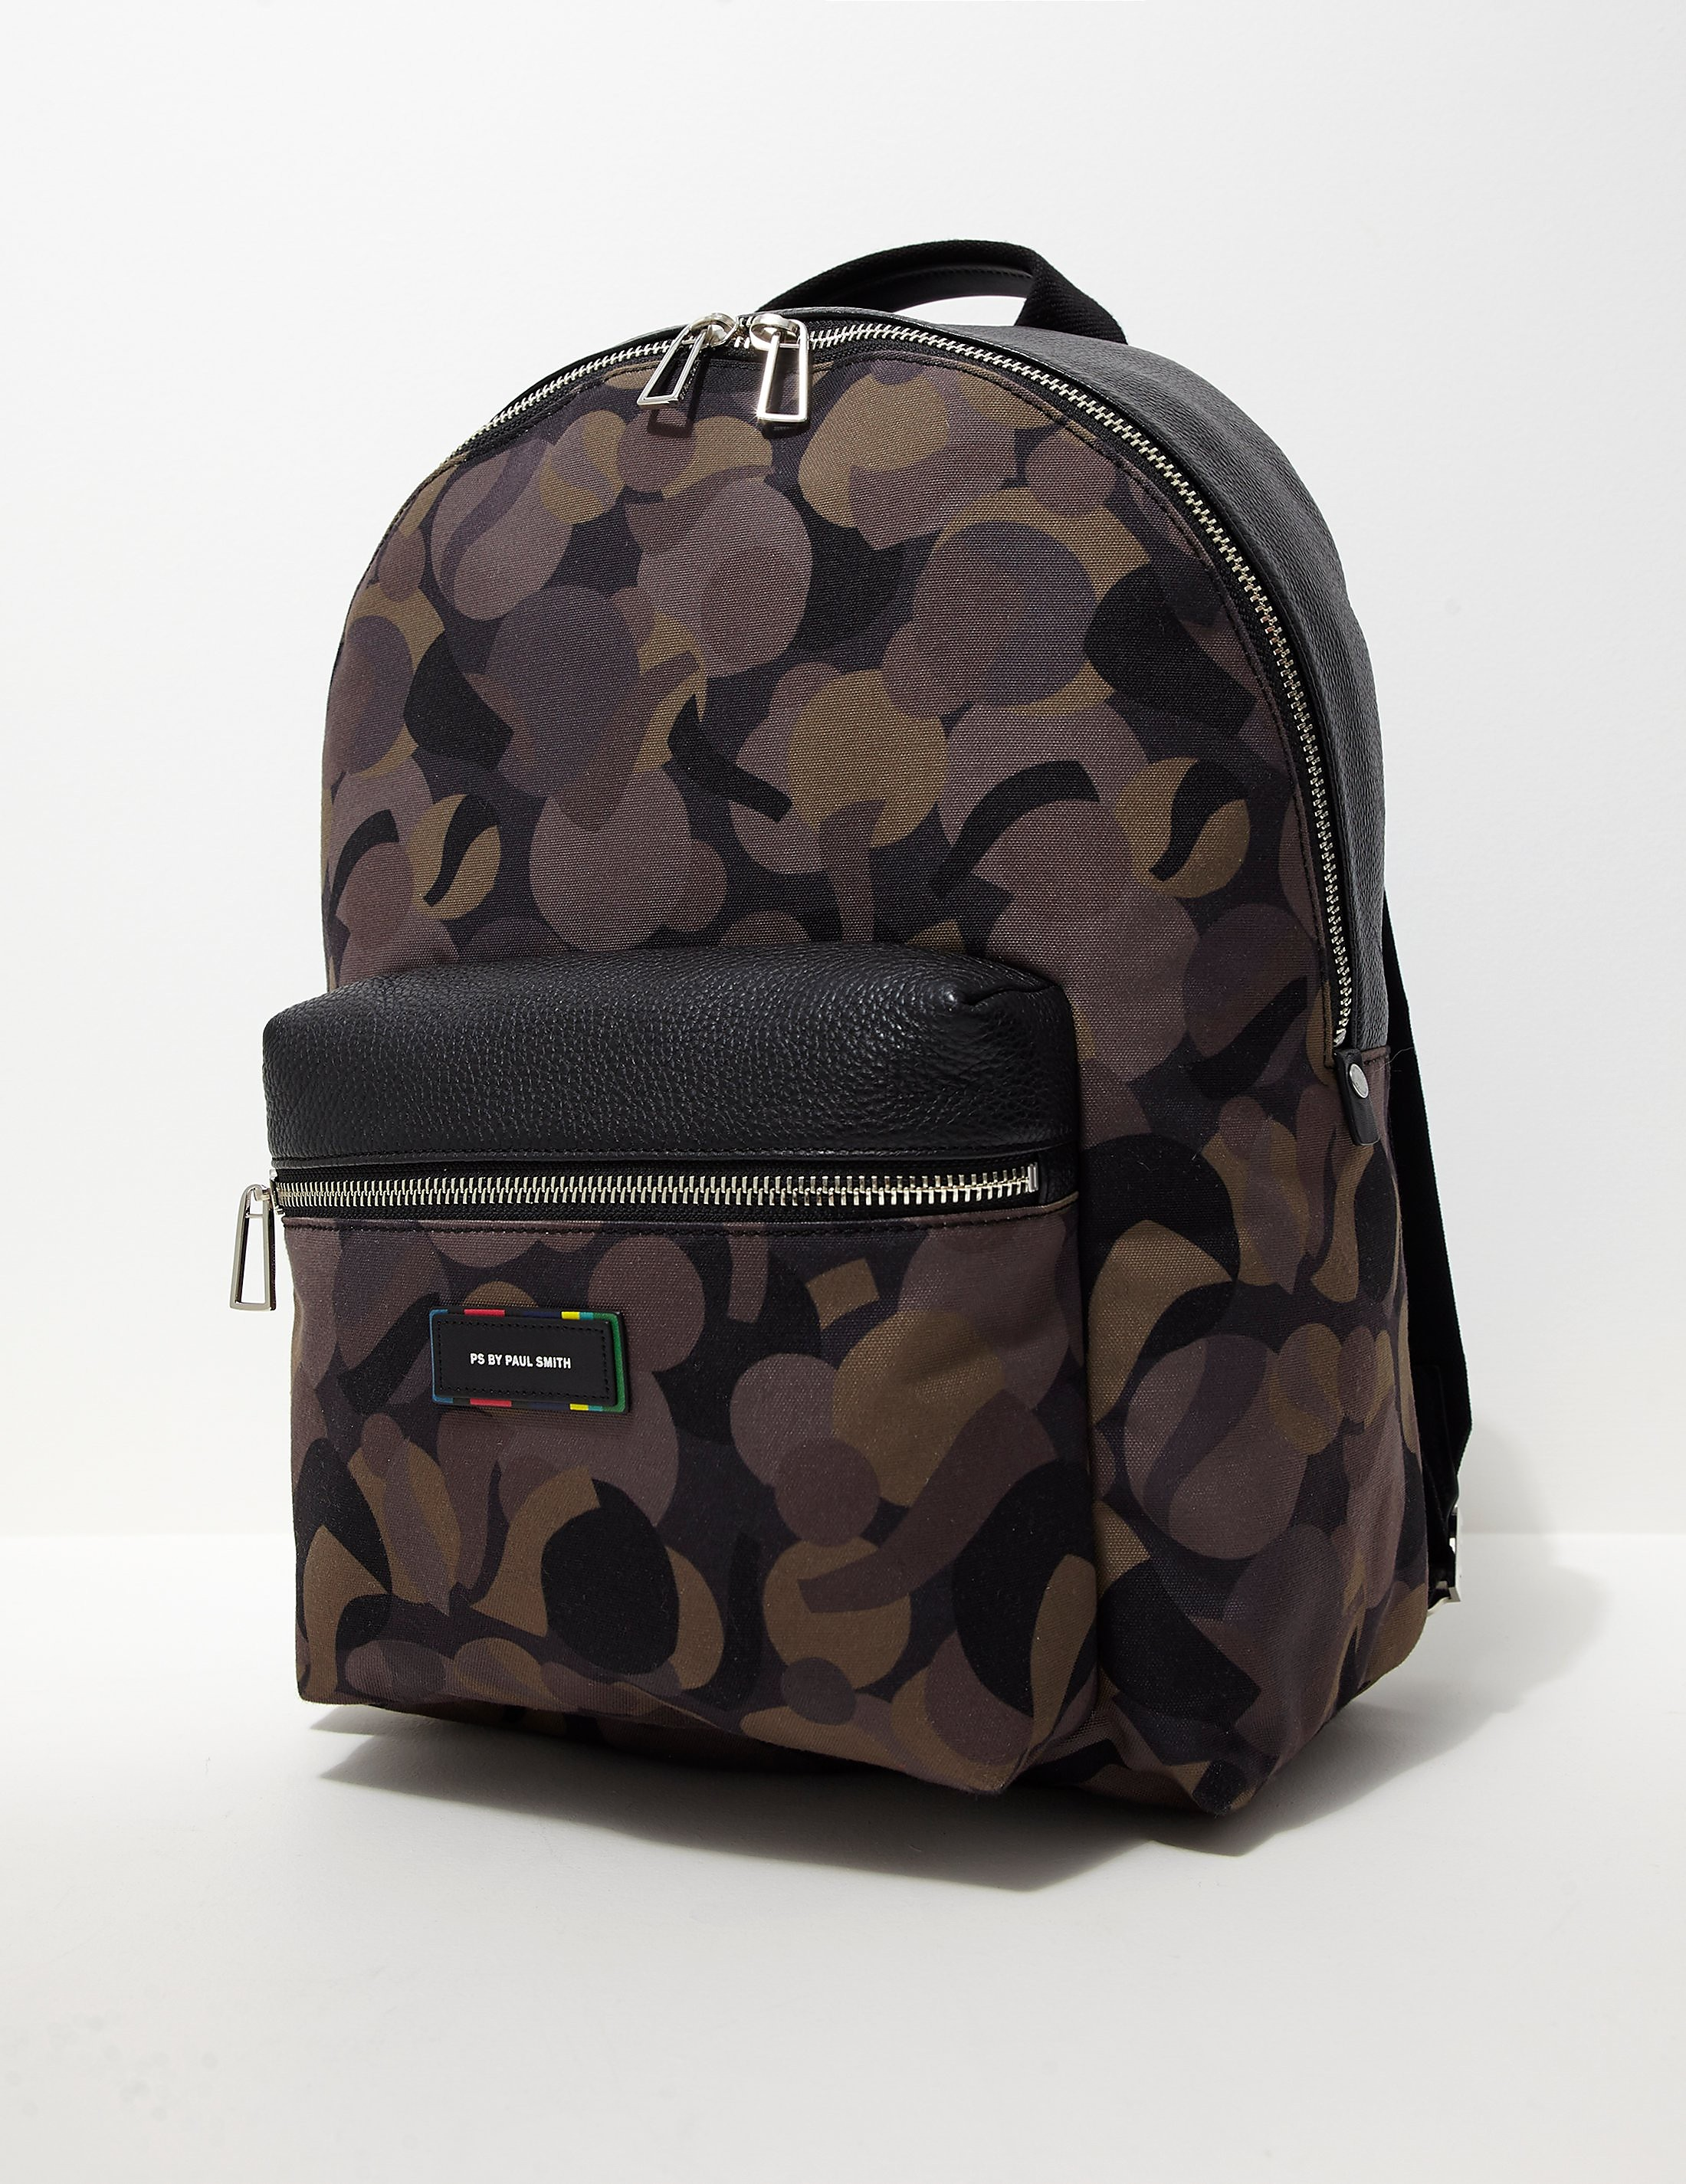 Paul Smith Camoflauge Backpack - Online Exclusive